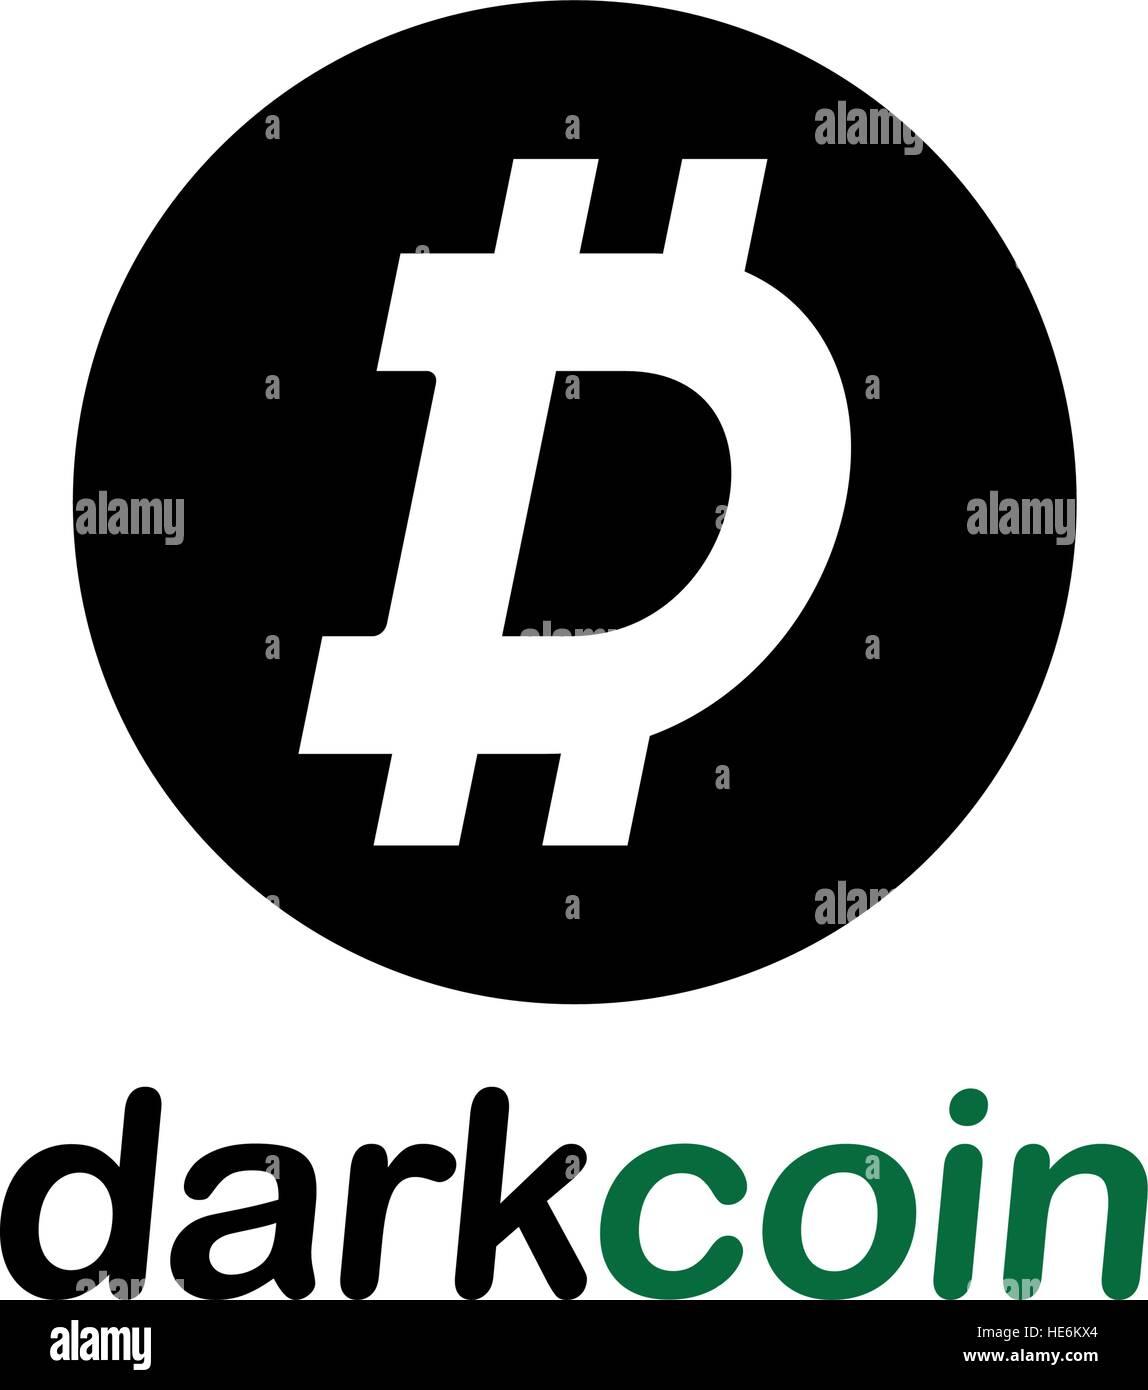 Dark Coin Concept Design, EPS 8 supported. Stock Vector